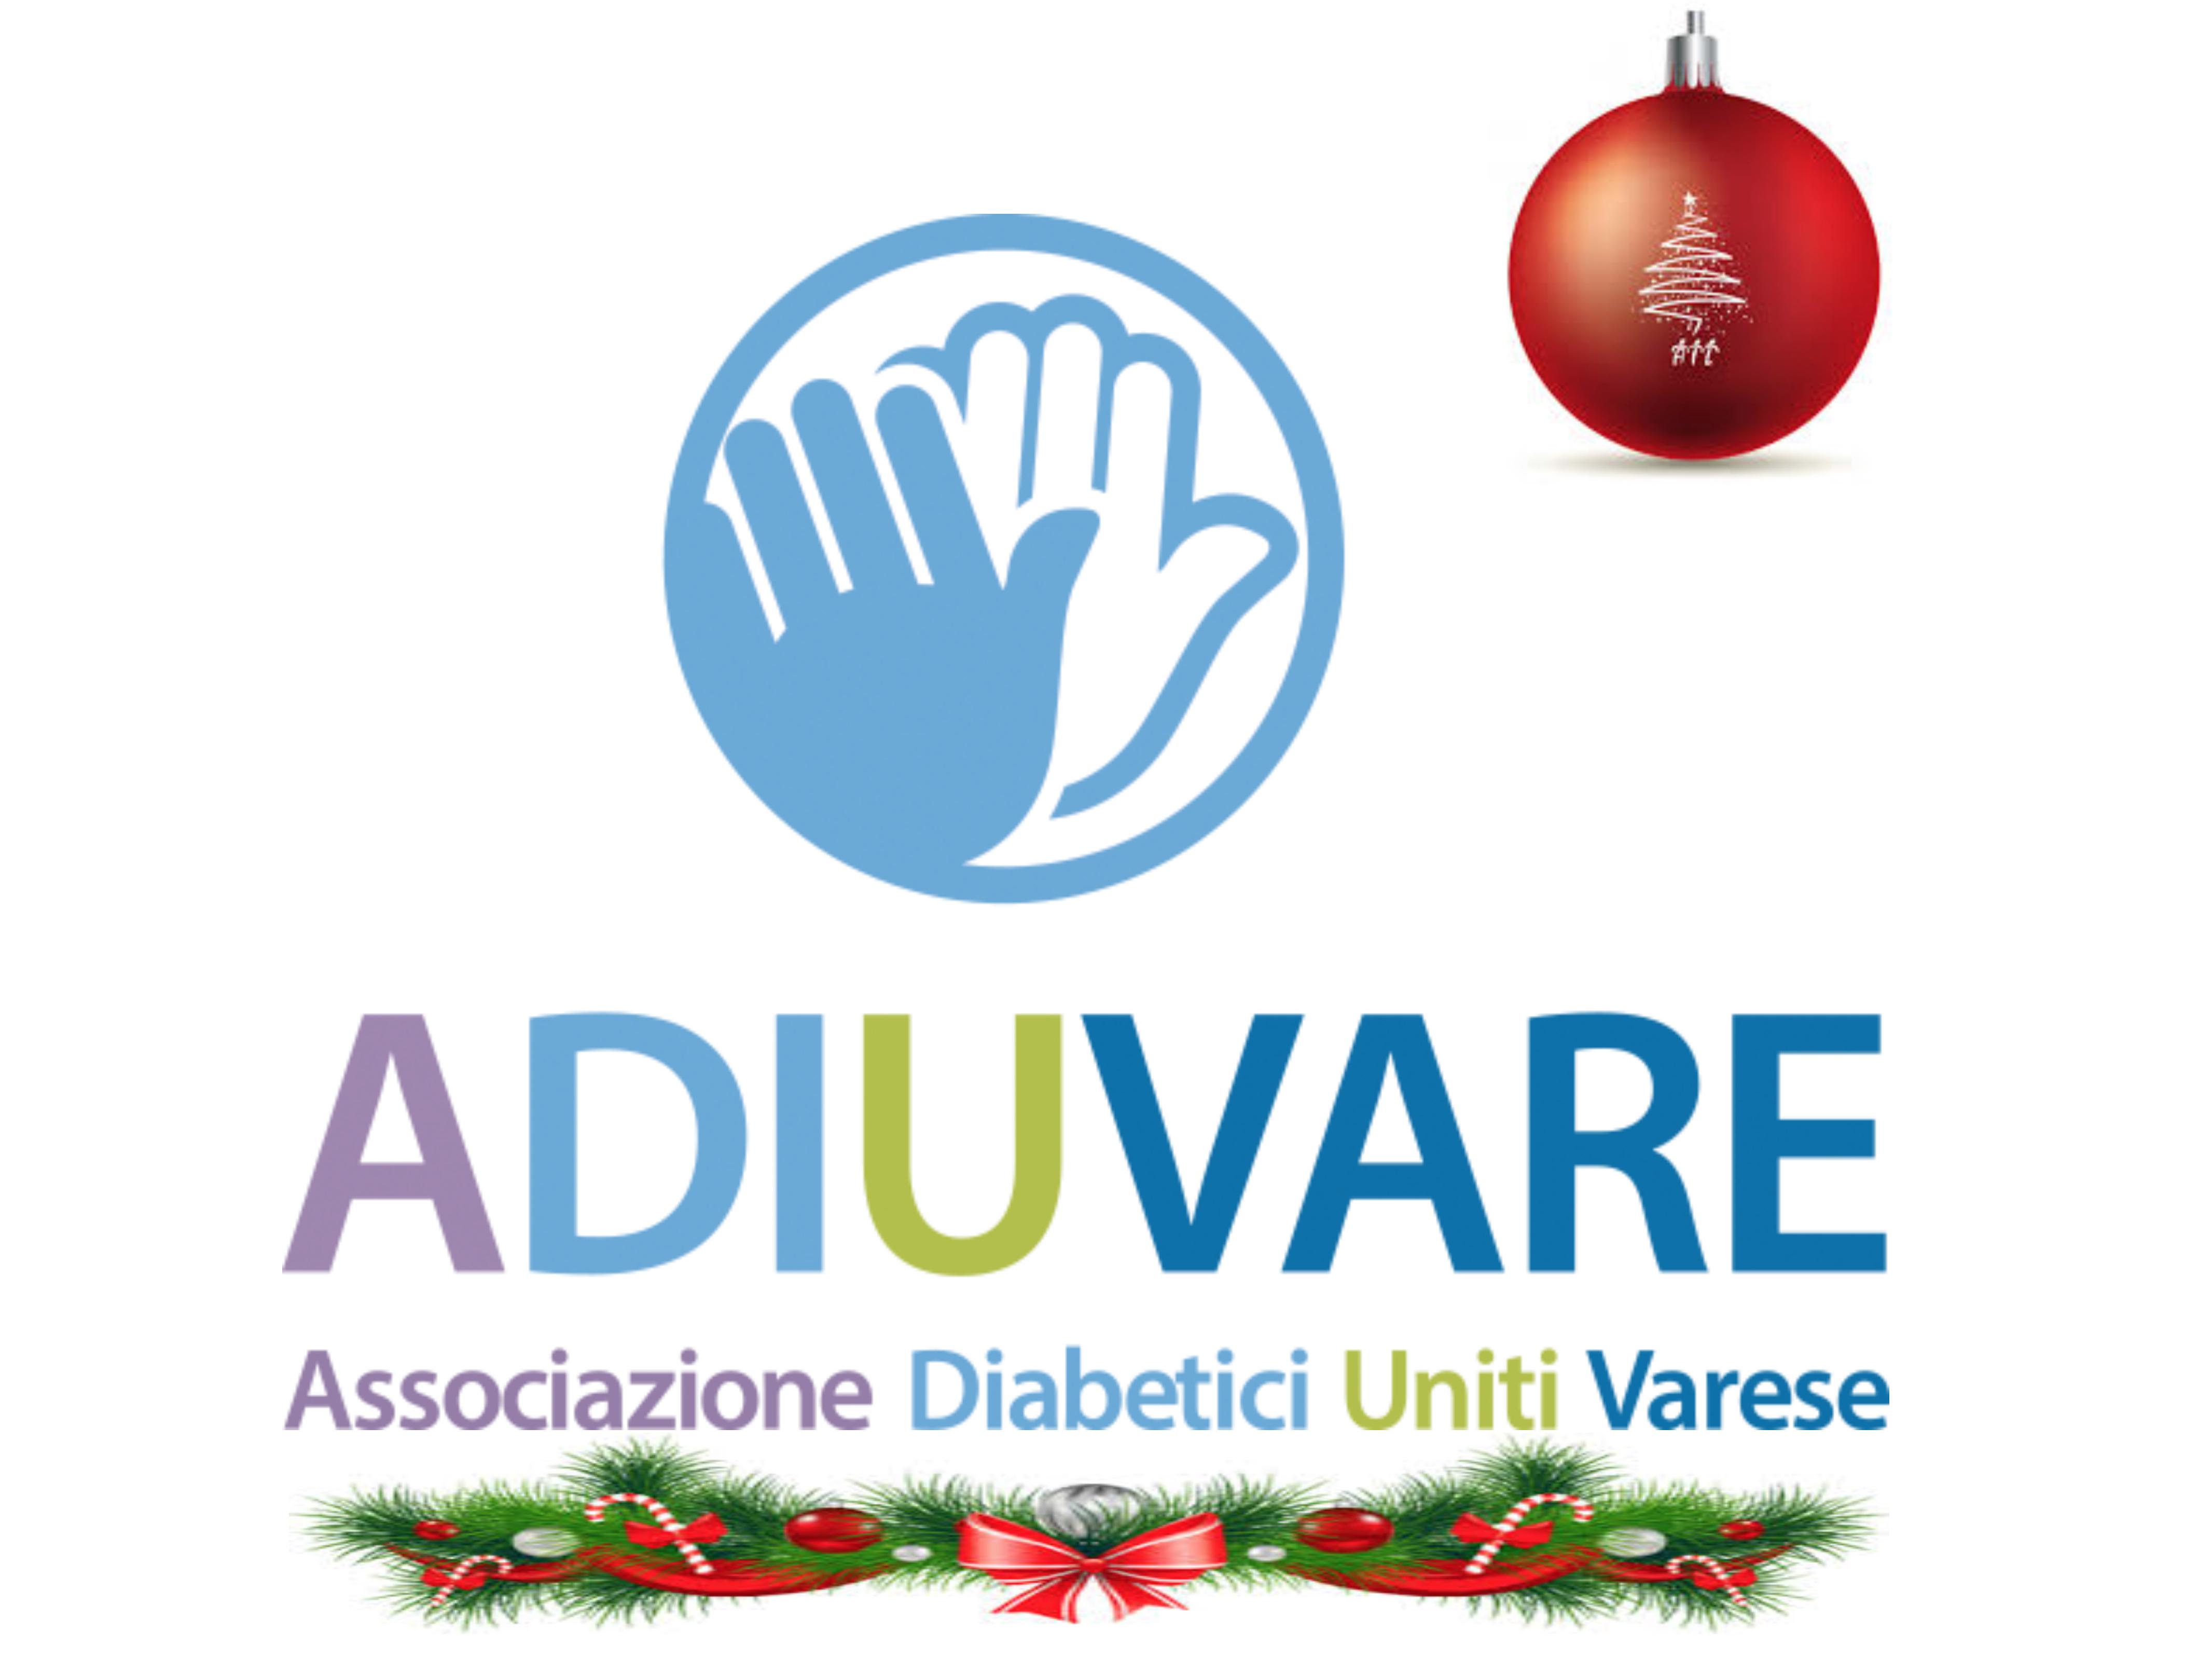 ADIUVARE (Associazione Diabetici Uniti Varese)- ODV Reg. Lombardia Logo